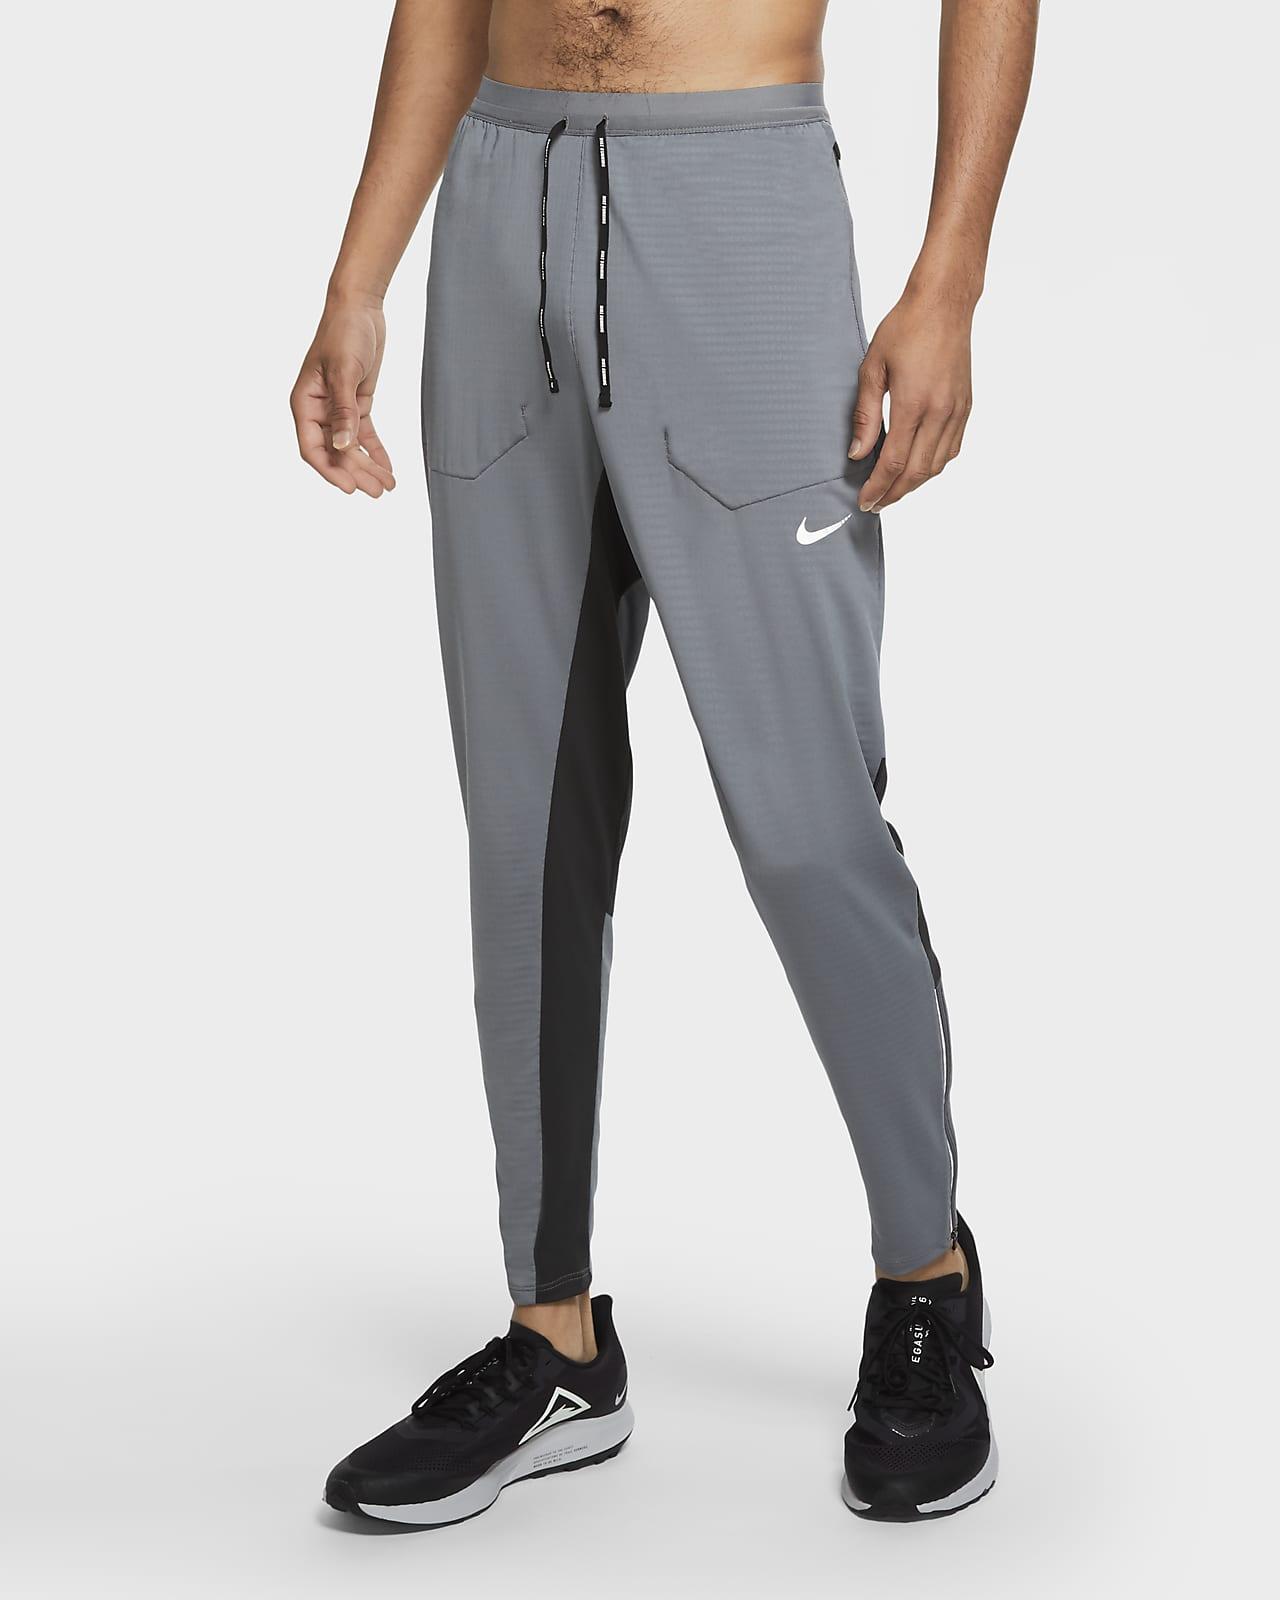 Nike Phenom Elite Knit hardloopbroek voor heren